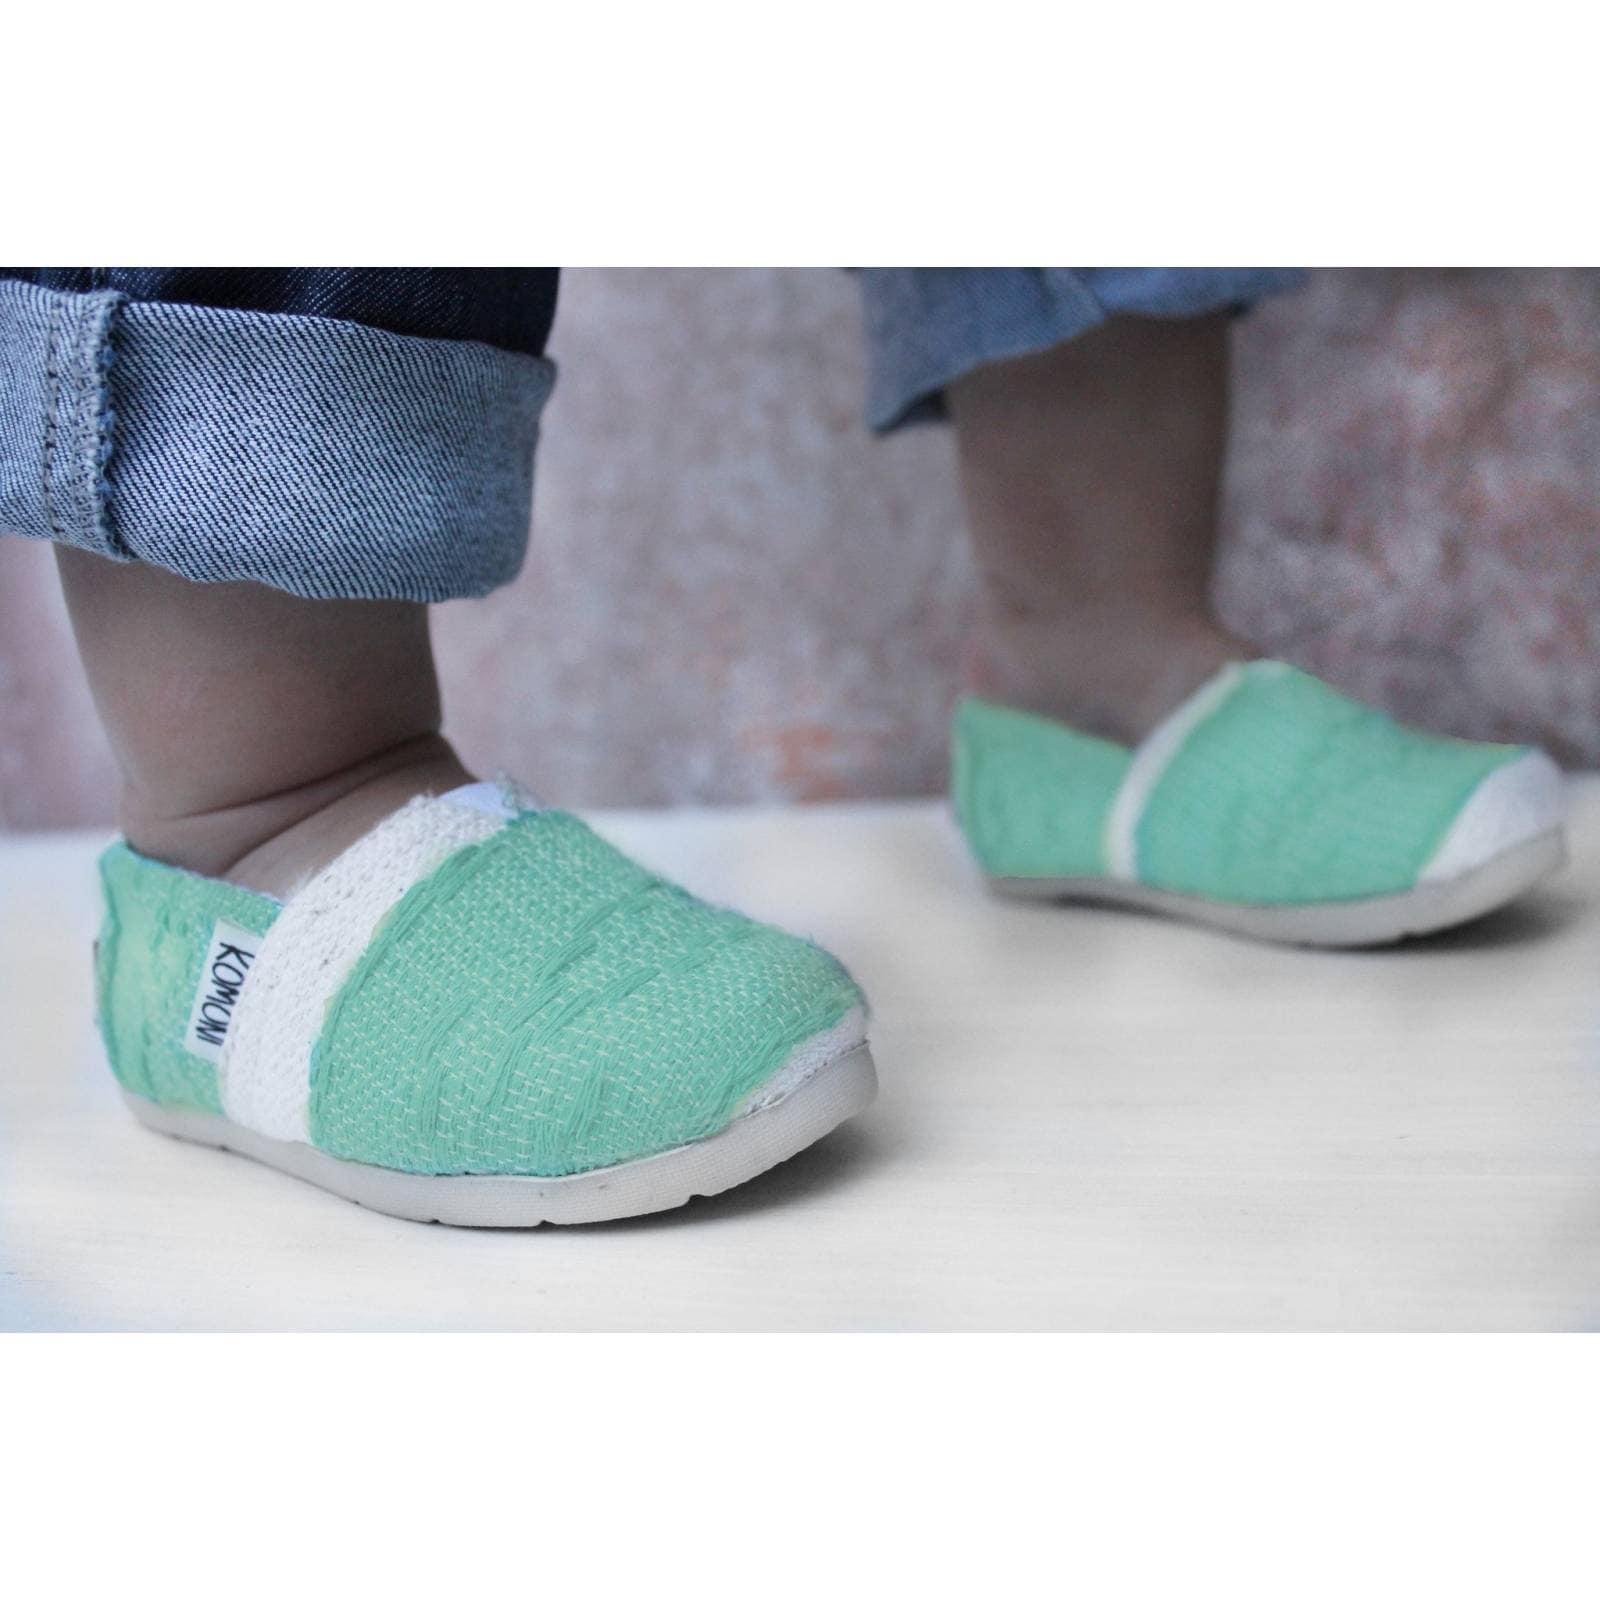 Zapato Alpargata Mini Jacinta Artesanal Tela Infantil Verde Komoni Talla: 12